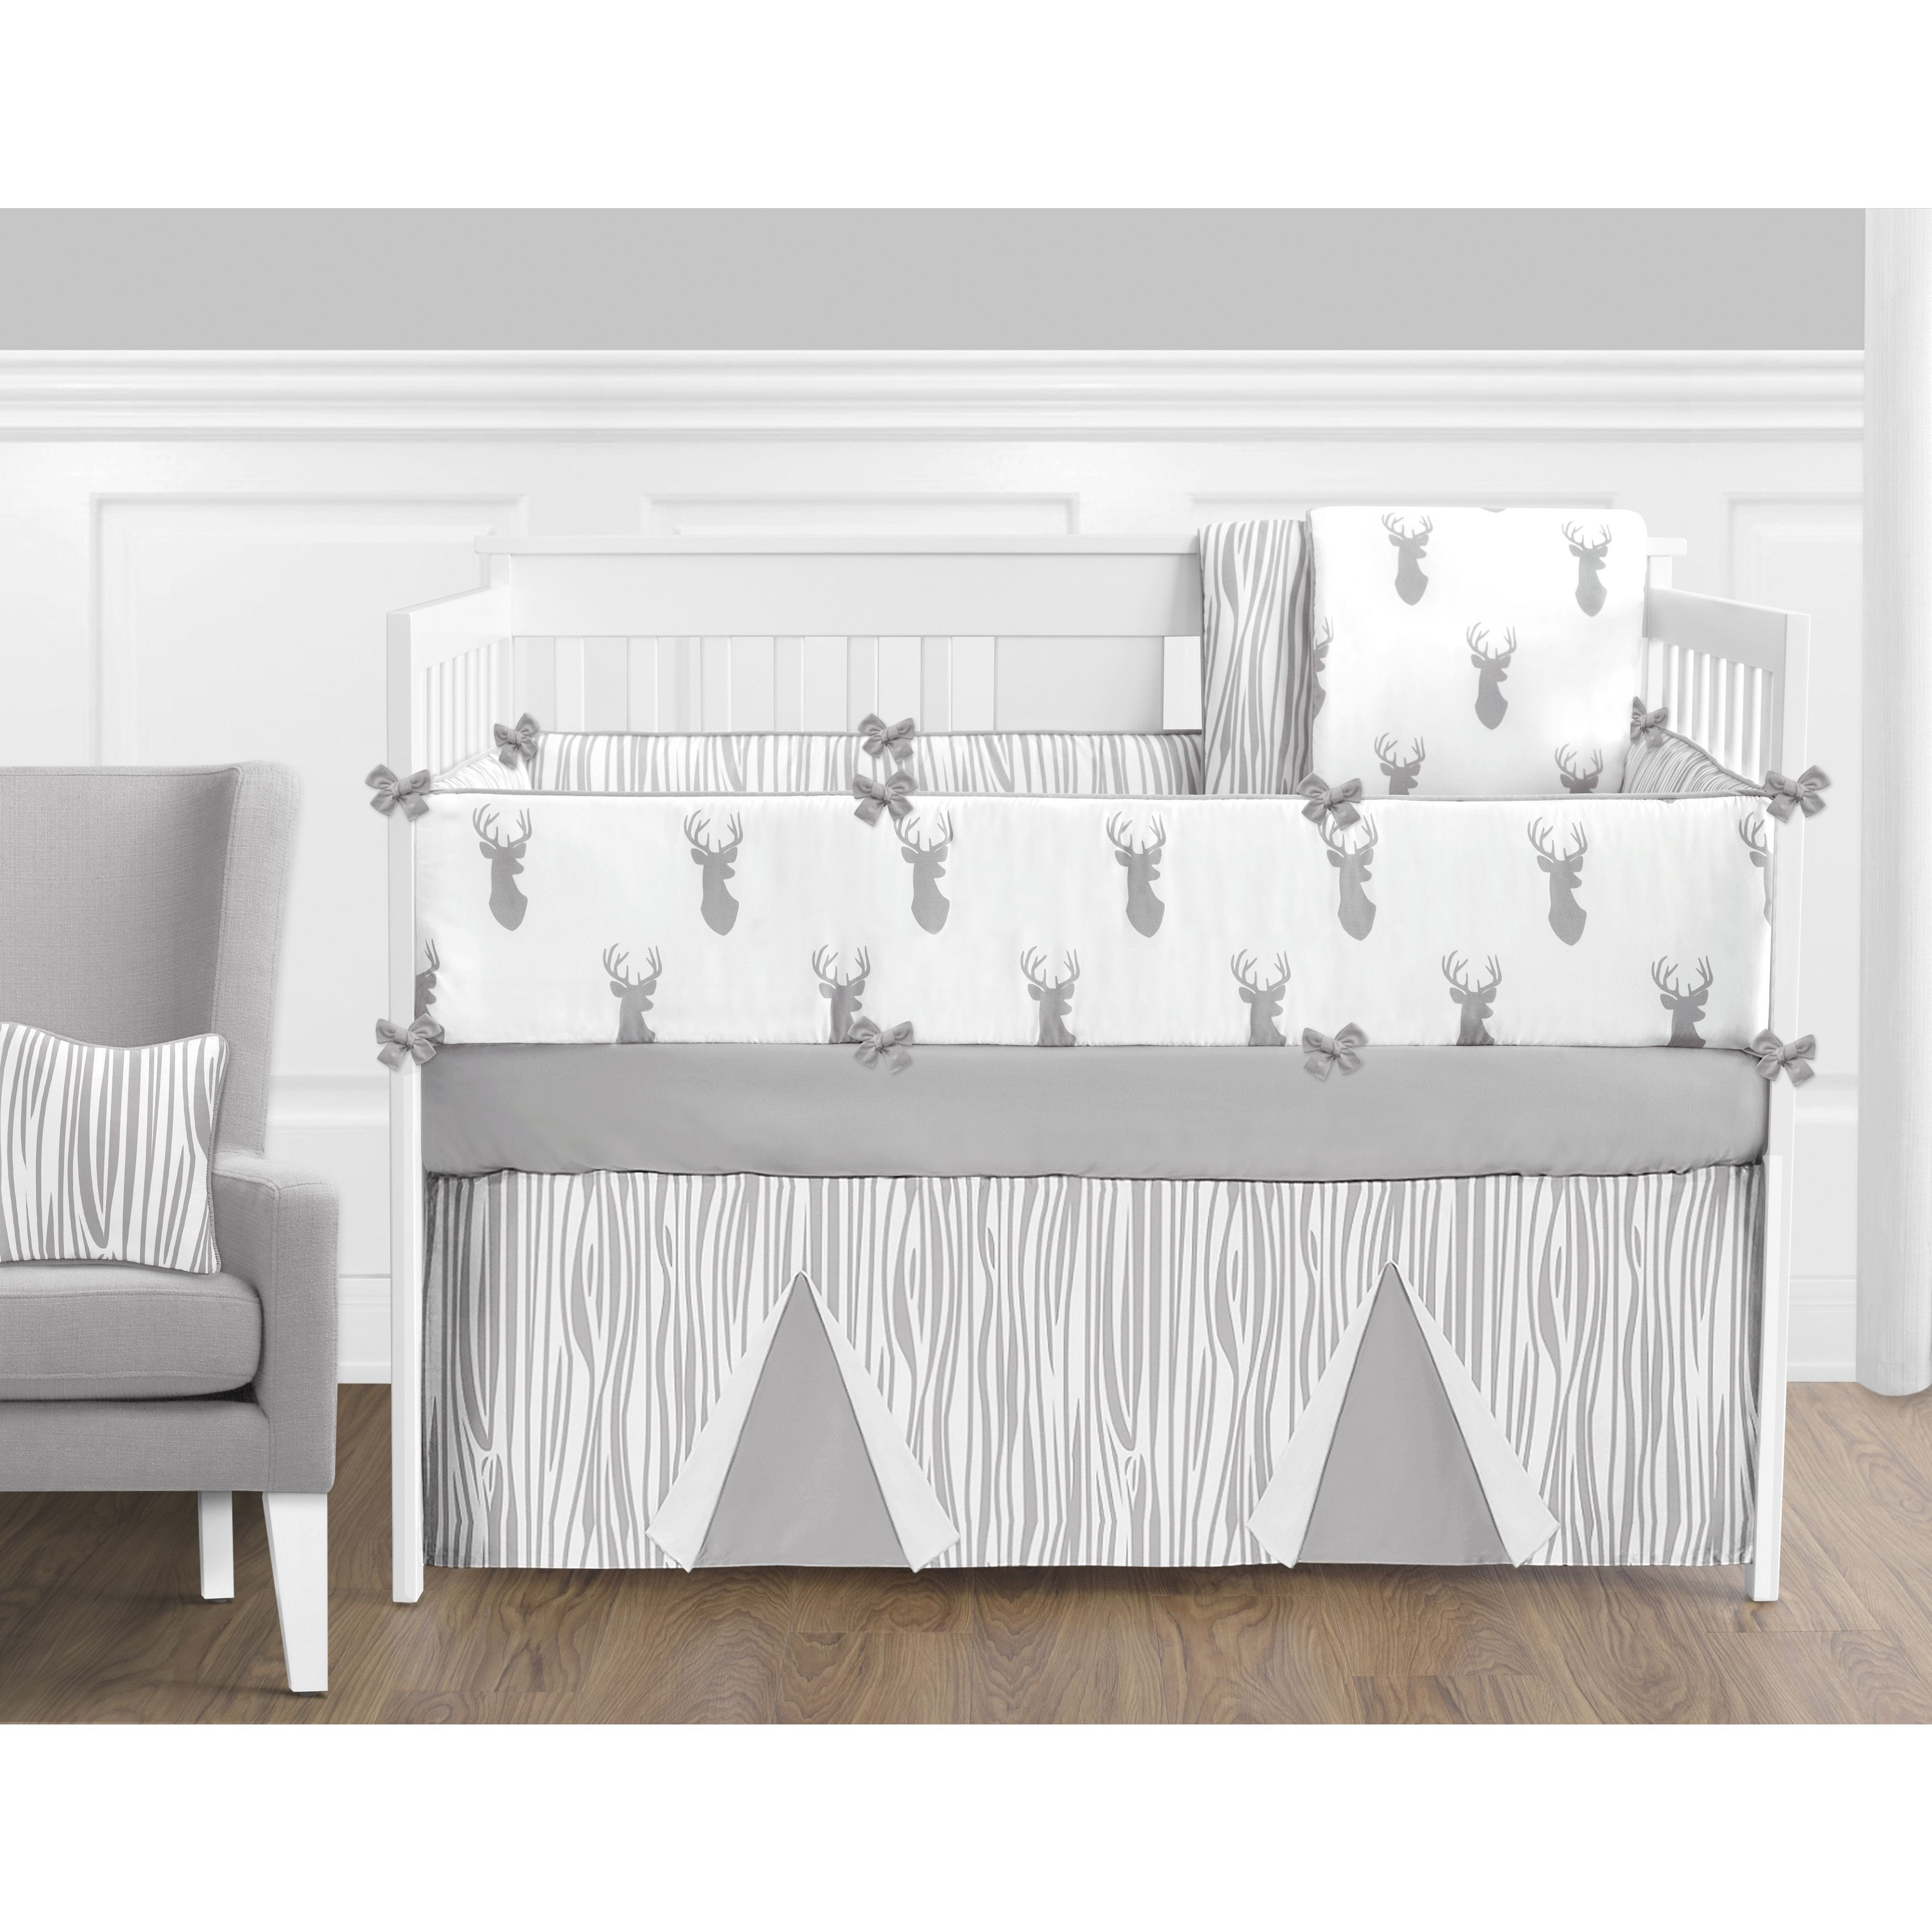 set cribs prod designs jojo full crib shop bedding queen spin zebra com collection index pink sweet cafeyak